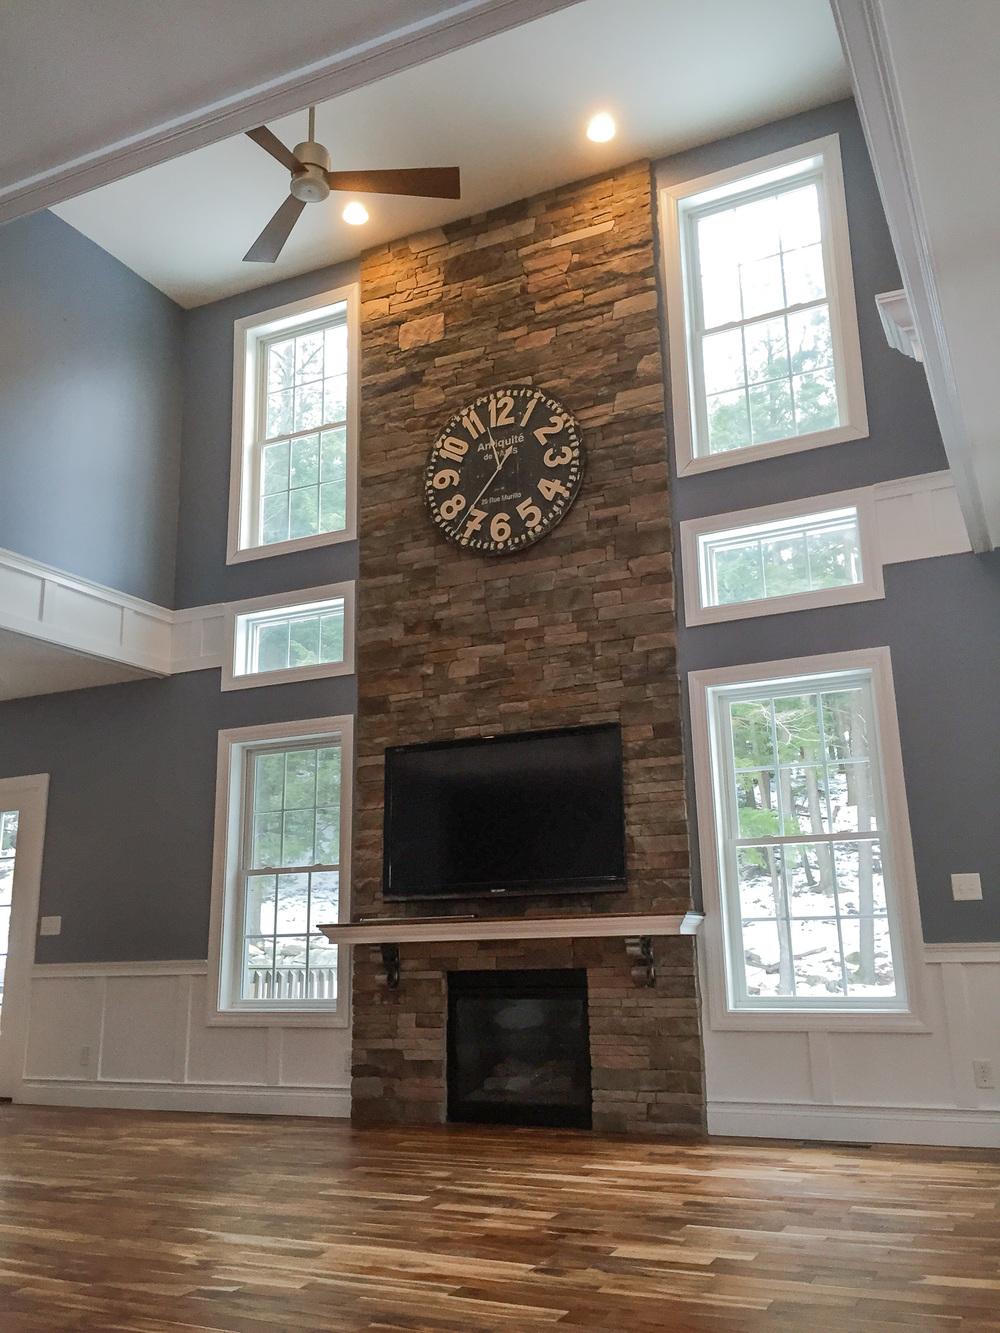 big-dog-painting-interior-floors-high-ceilings.jpg